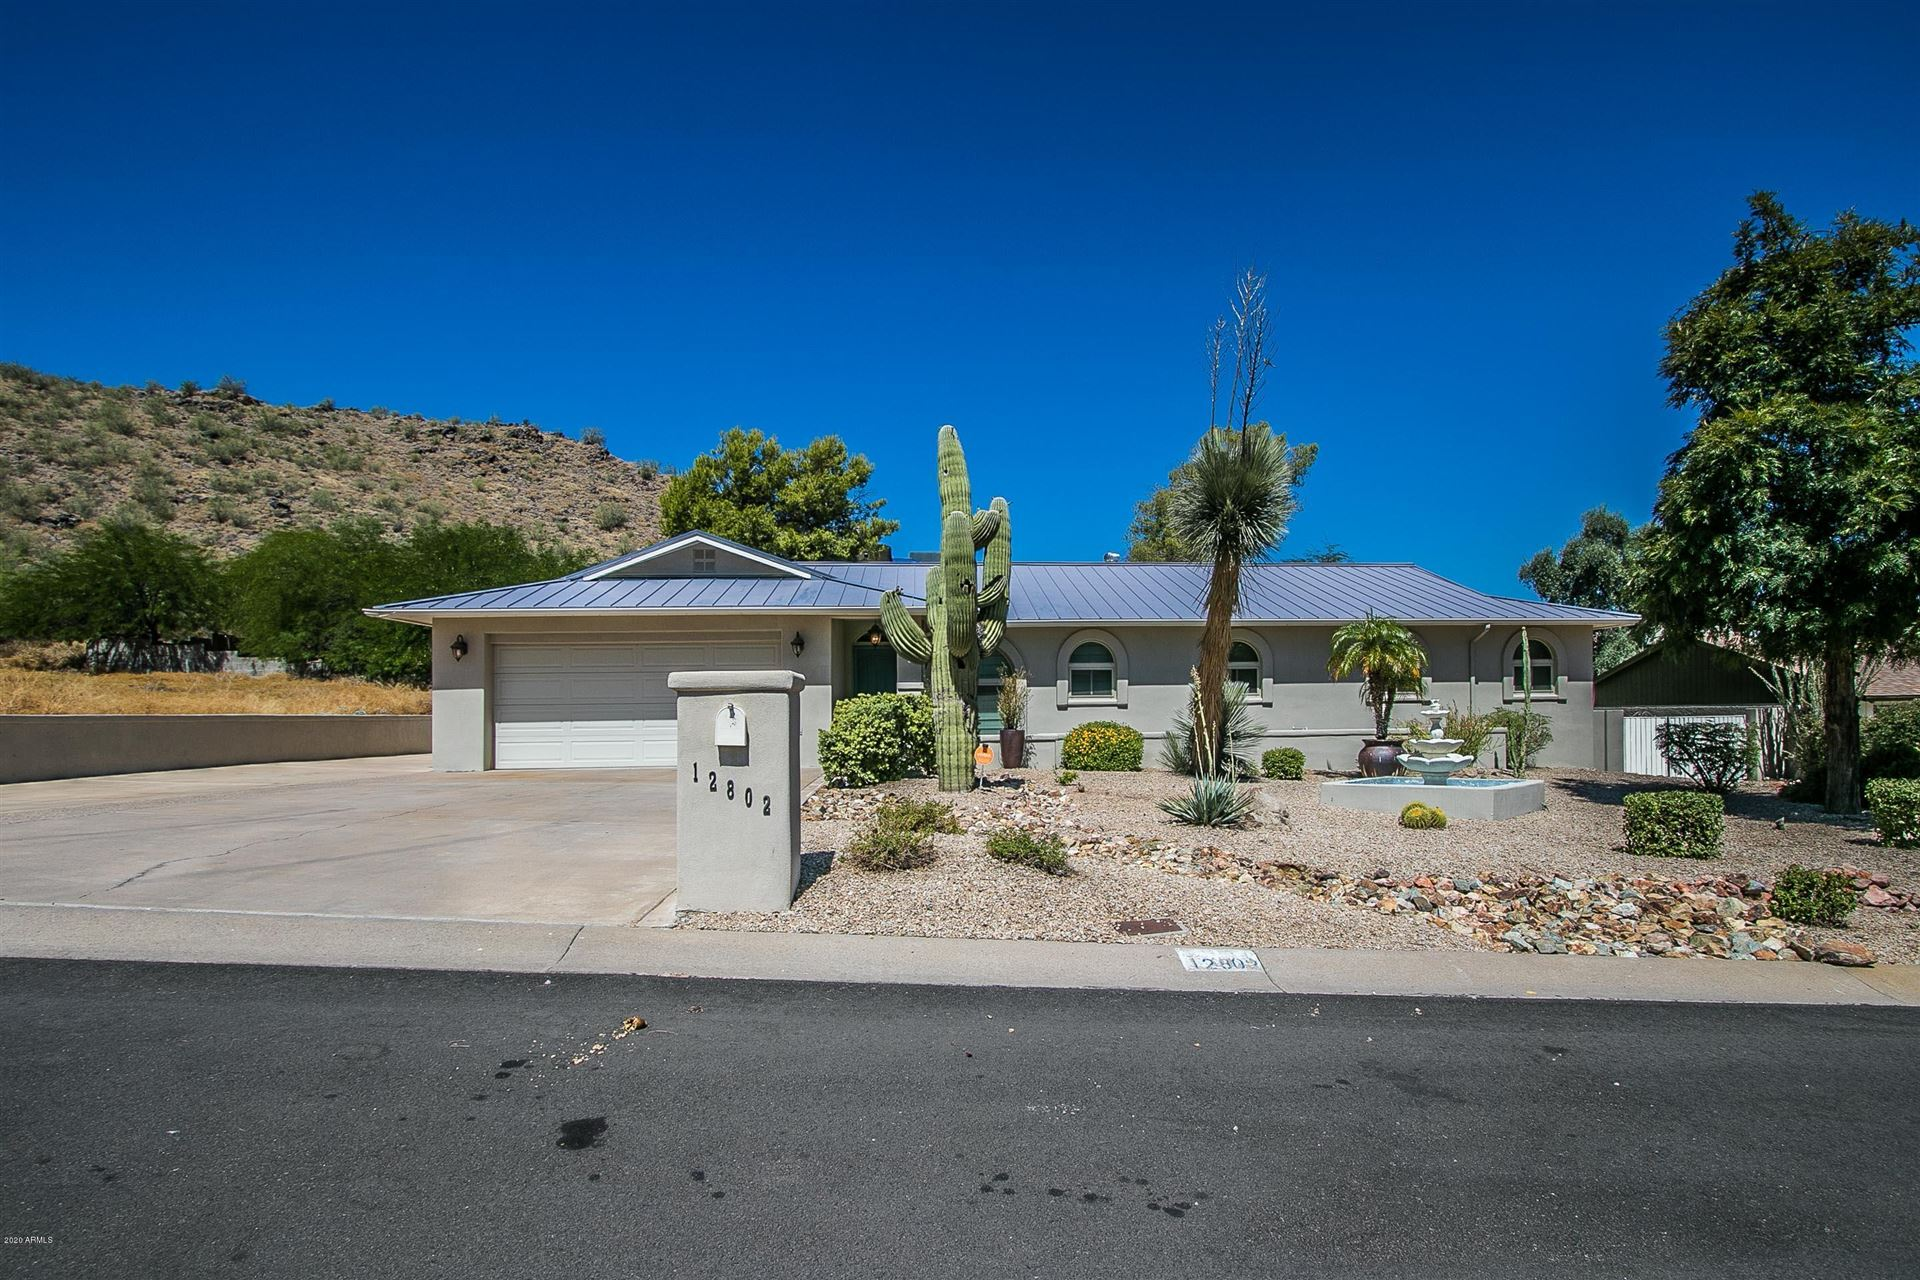 12802 N 17TH Avenue, Phoenix, AZ 85029 - MLS#: 6092510